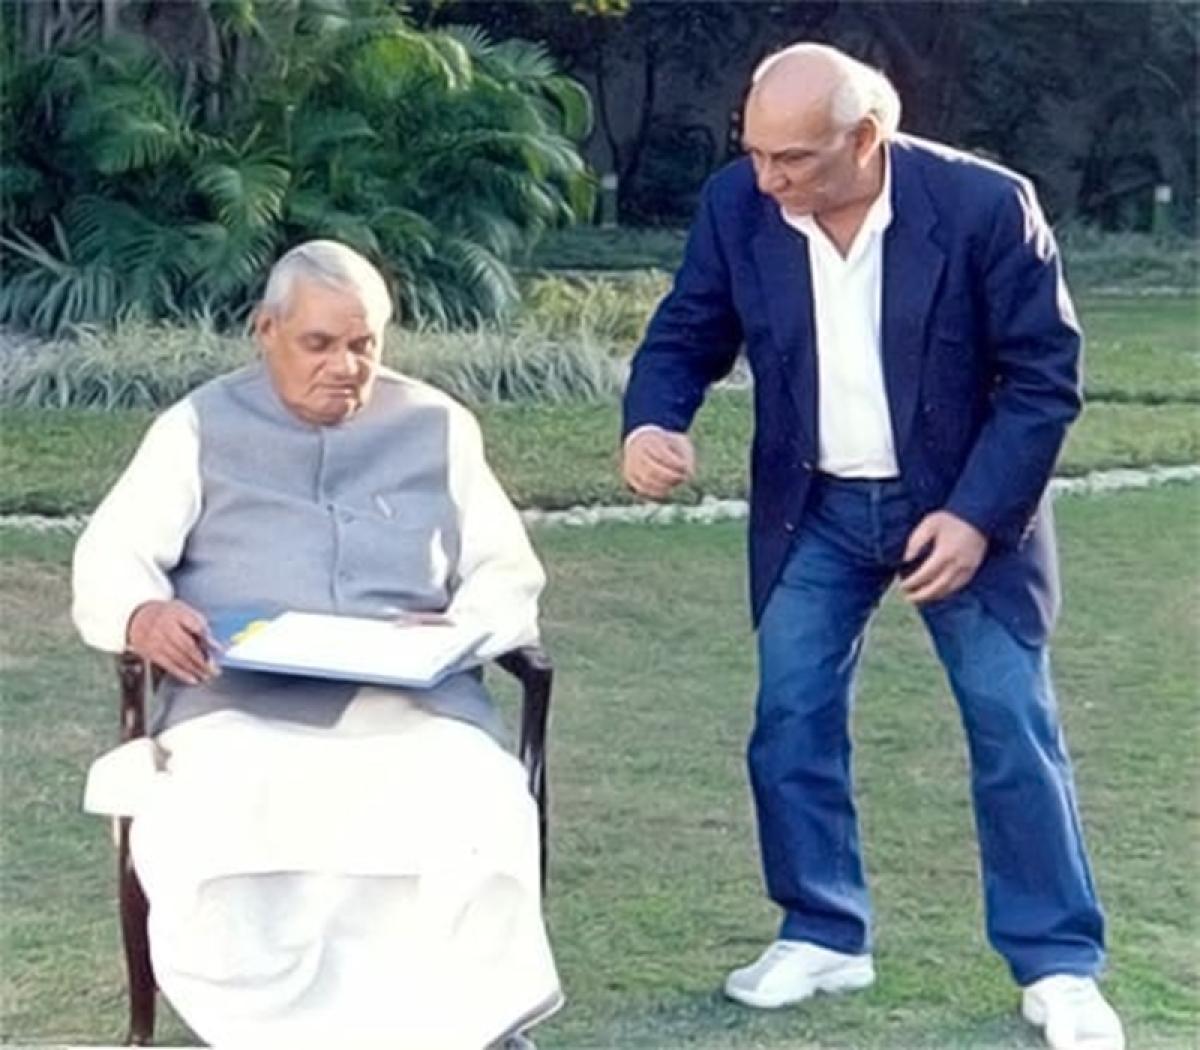 Throwback Thursday! When Yash Chopra directed former PM Atal Bihari Vajpayee for music video